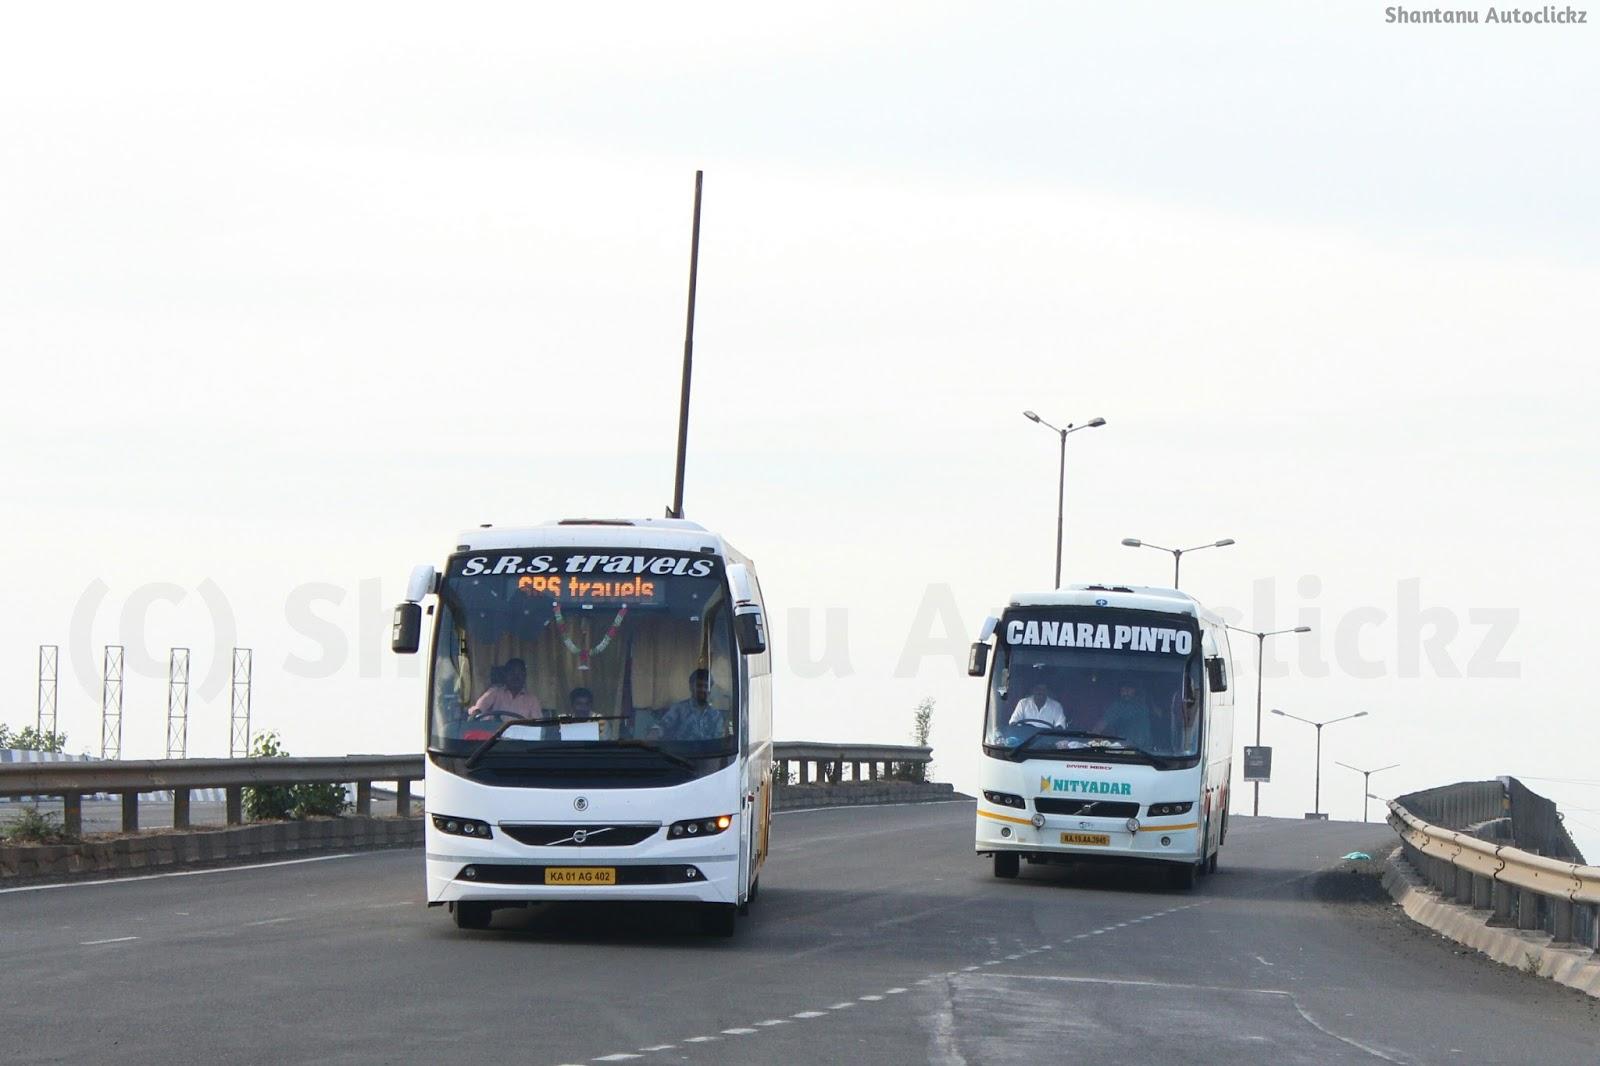 bus_2 d88b8a80abc490ba34a329c1930b180b127e016fa77cb674d9ed78ff73ec0791 jpg